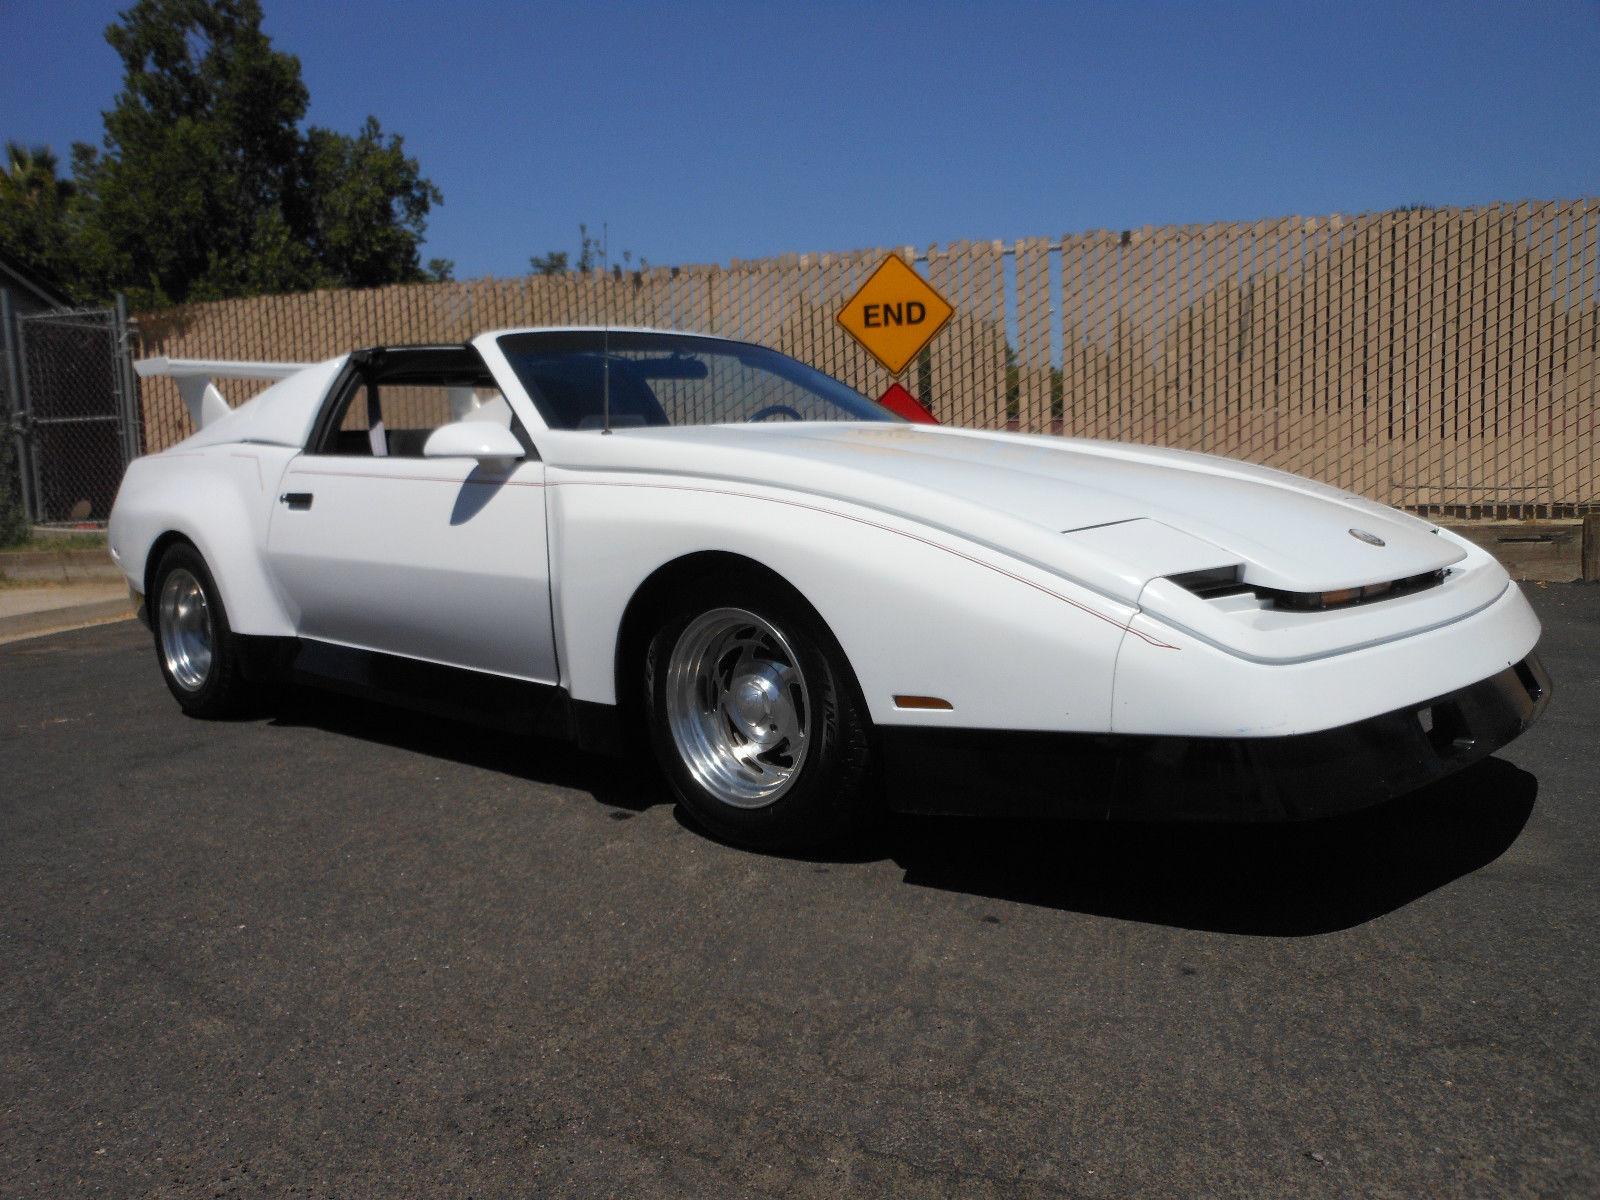 1991 Pontiac Tojan Firebird Camaro For Sale In Turlock California United States